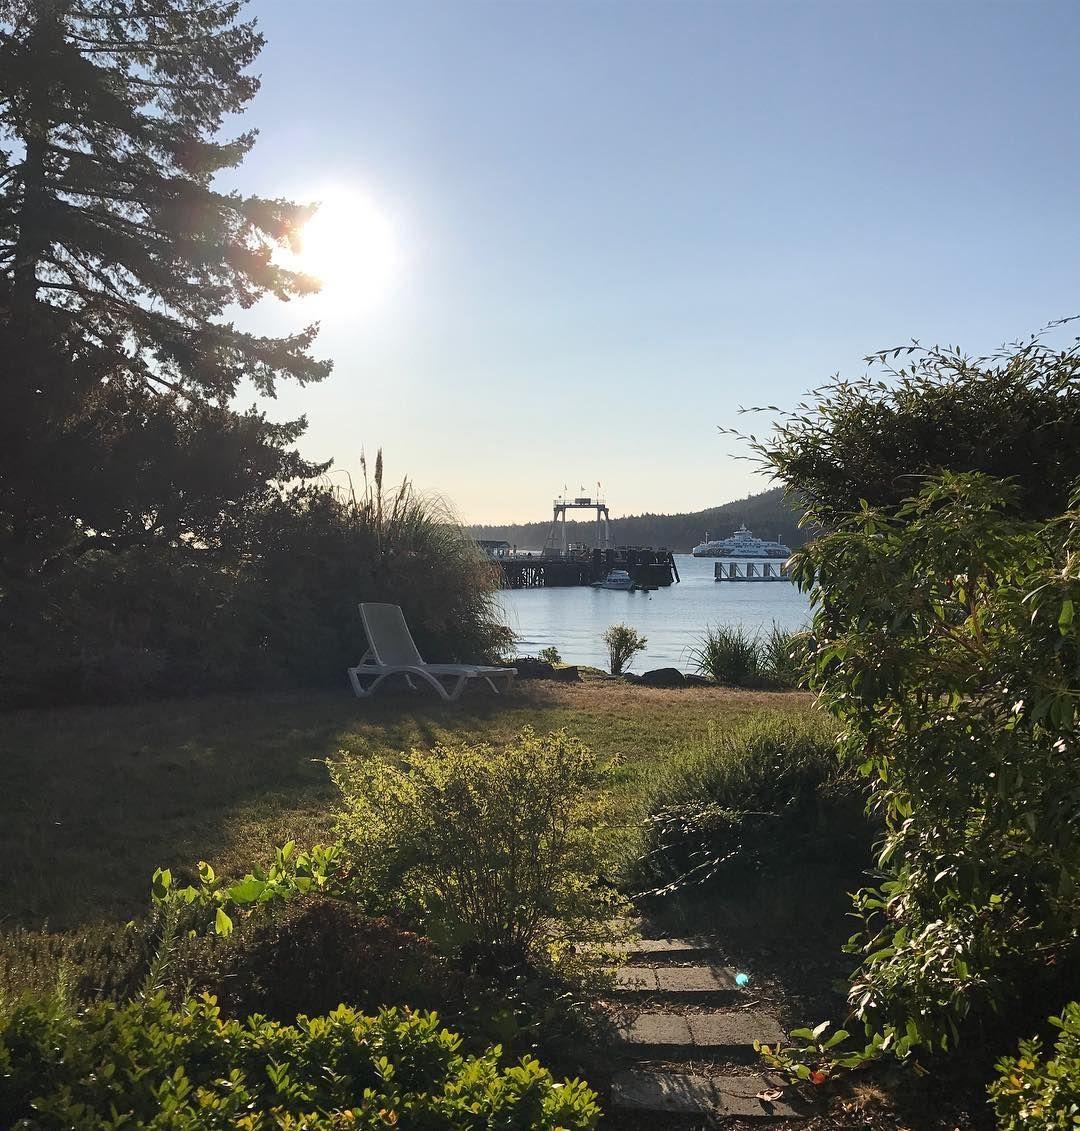 Morning view. @galianoinnspa @hellobc @southerngulfislands @galianoisland #sunrise #viewfrommydeck #islandlife #roomwithaview #ferry #ocean #ferrydock #sunshine #westcoast #hotel #travelgram